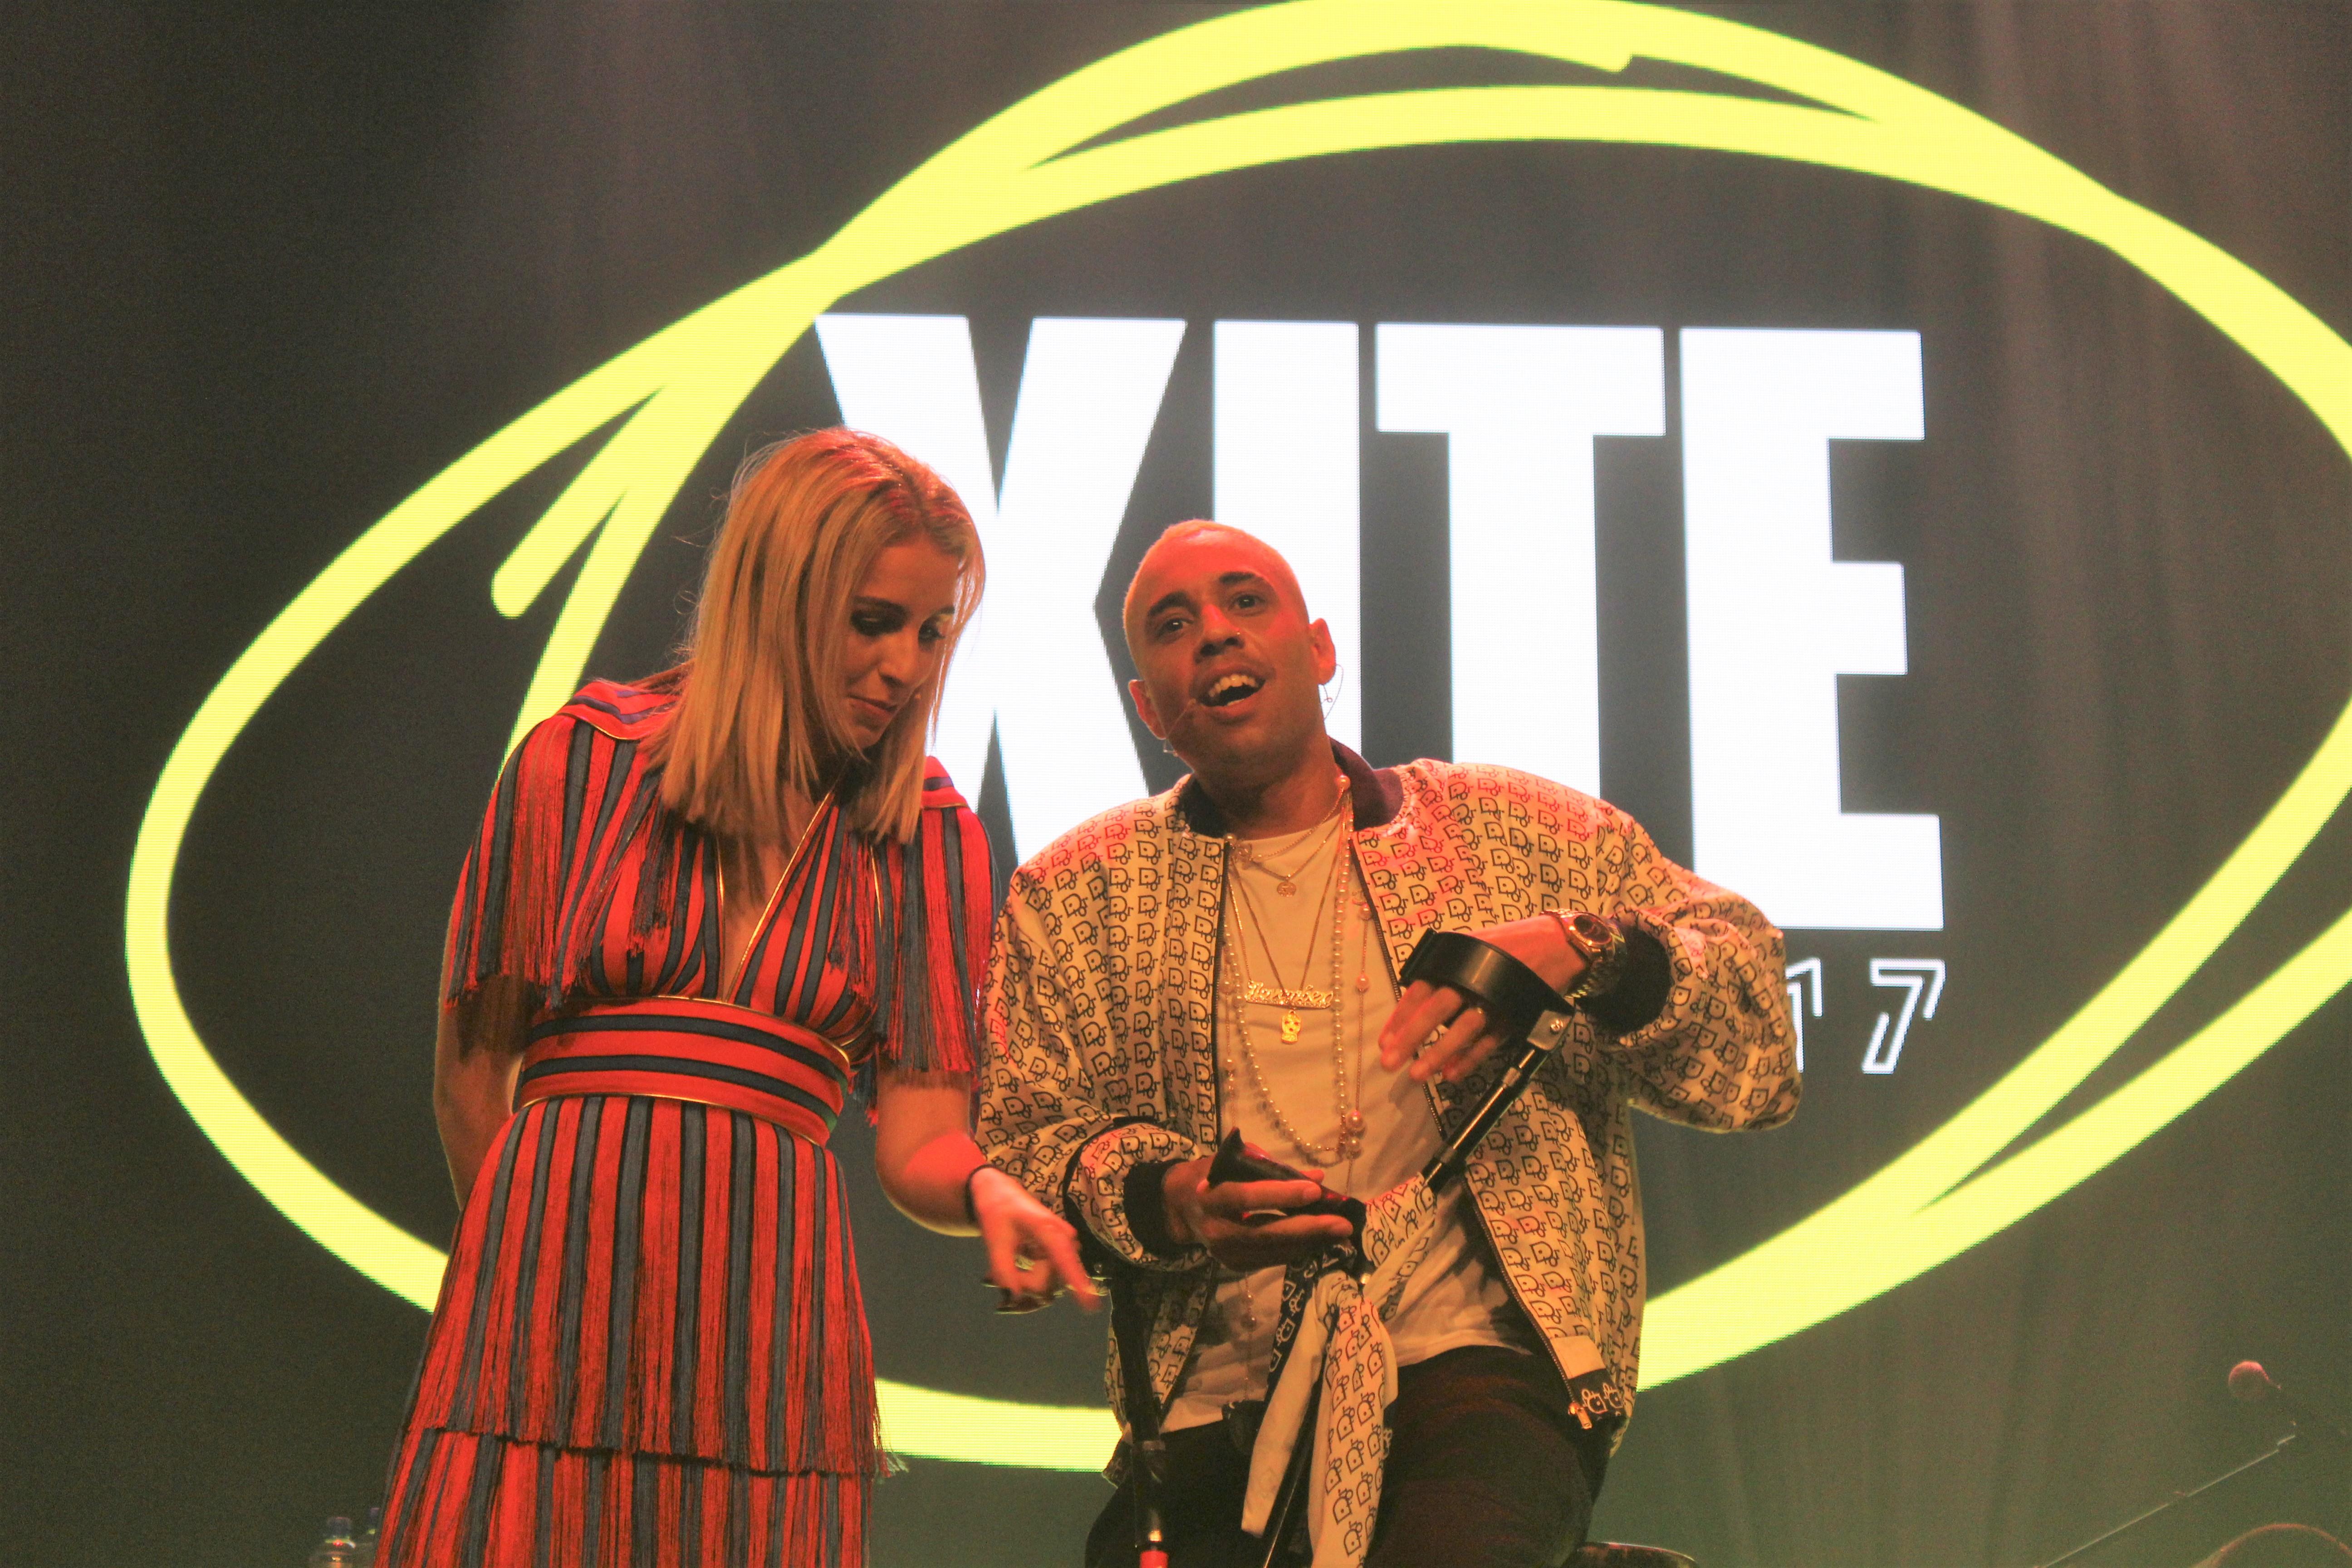 Iris Enthoven en MC Bizzey @ XITE Awards - Fotocredits: Chenneti Ascencion (Artiestennieuws)